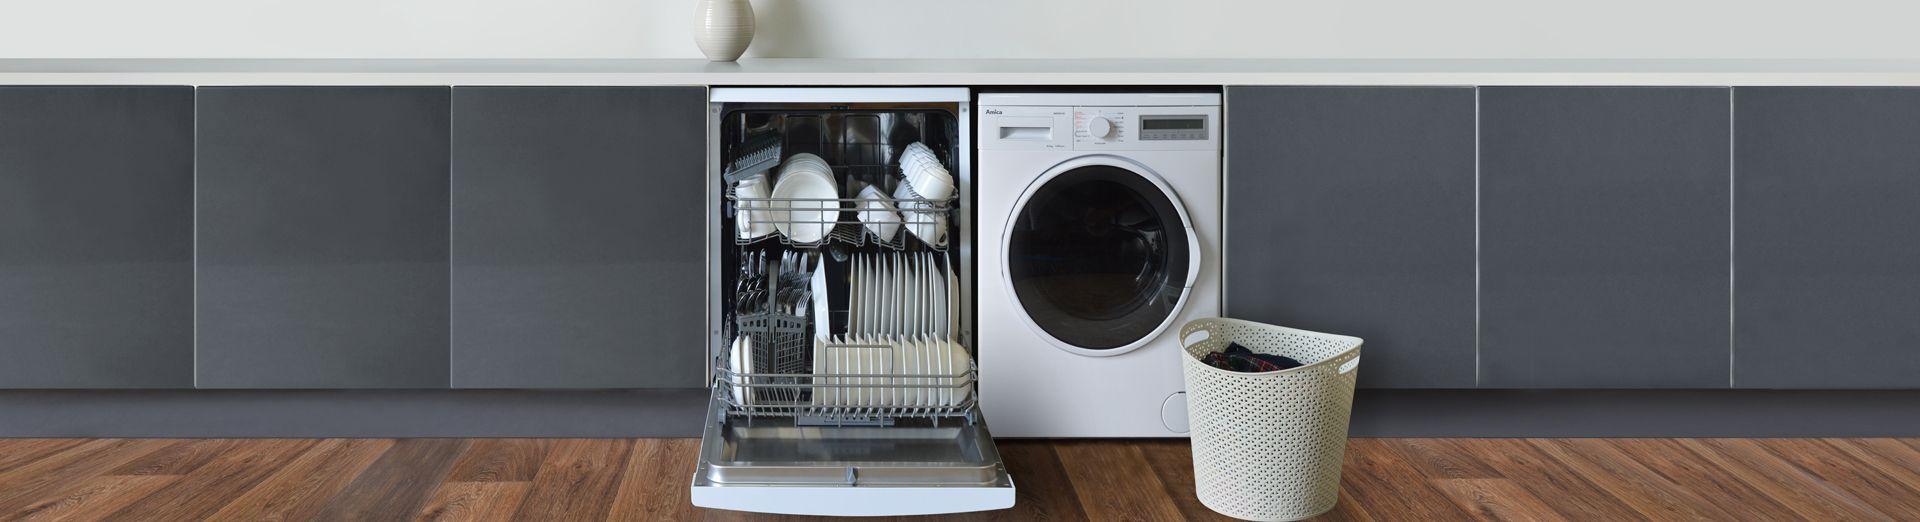 Dishwashers top banner image